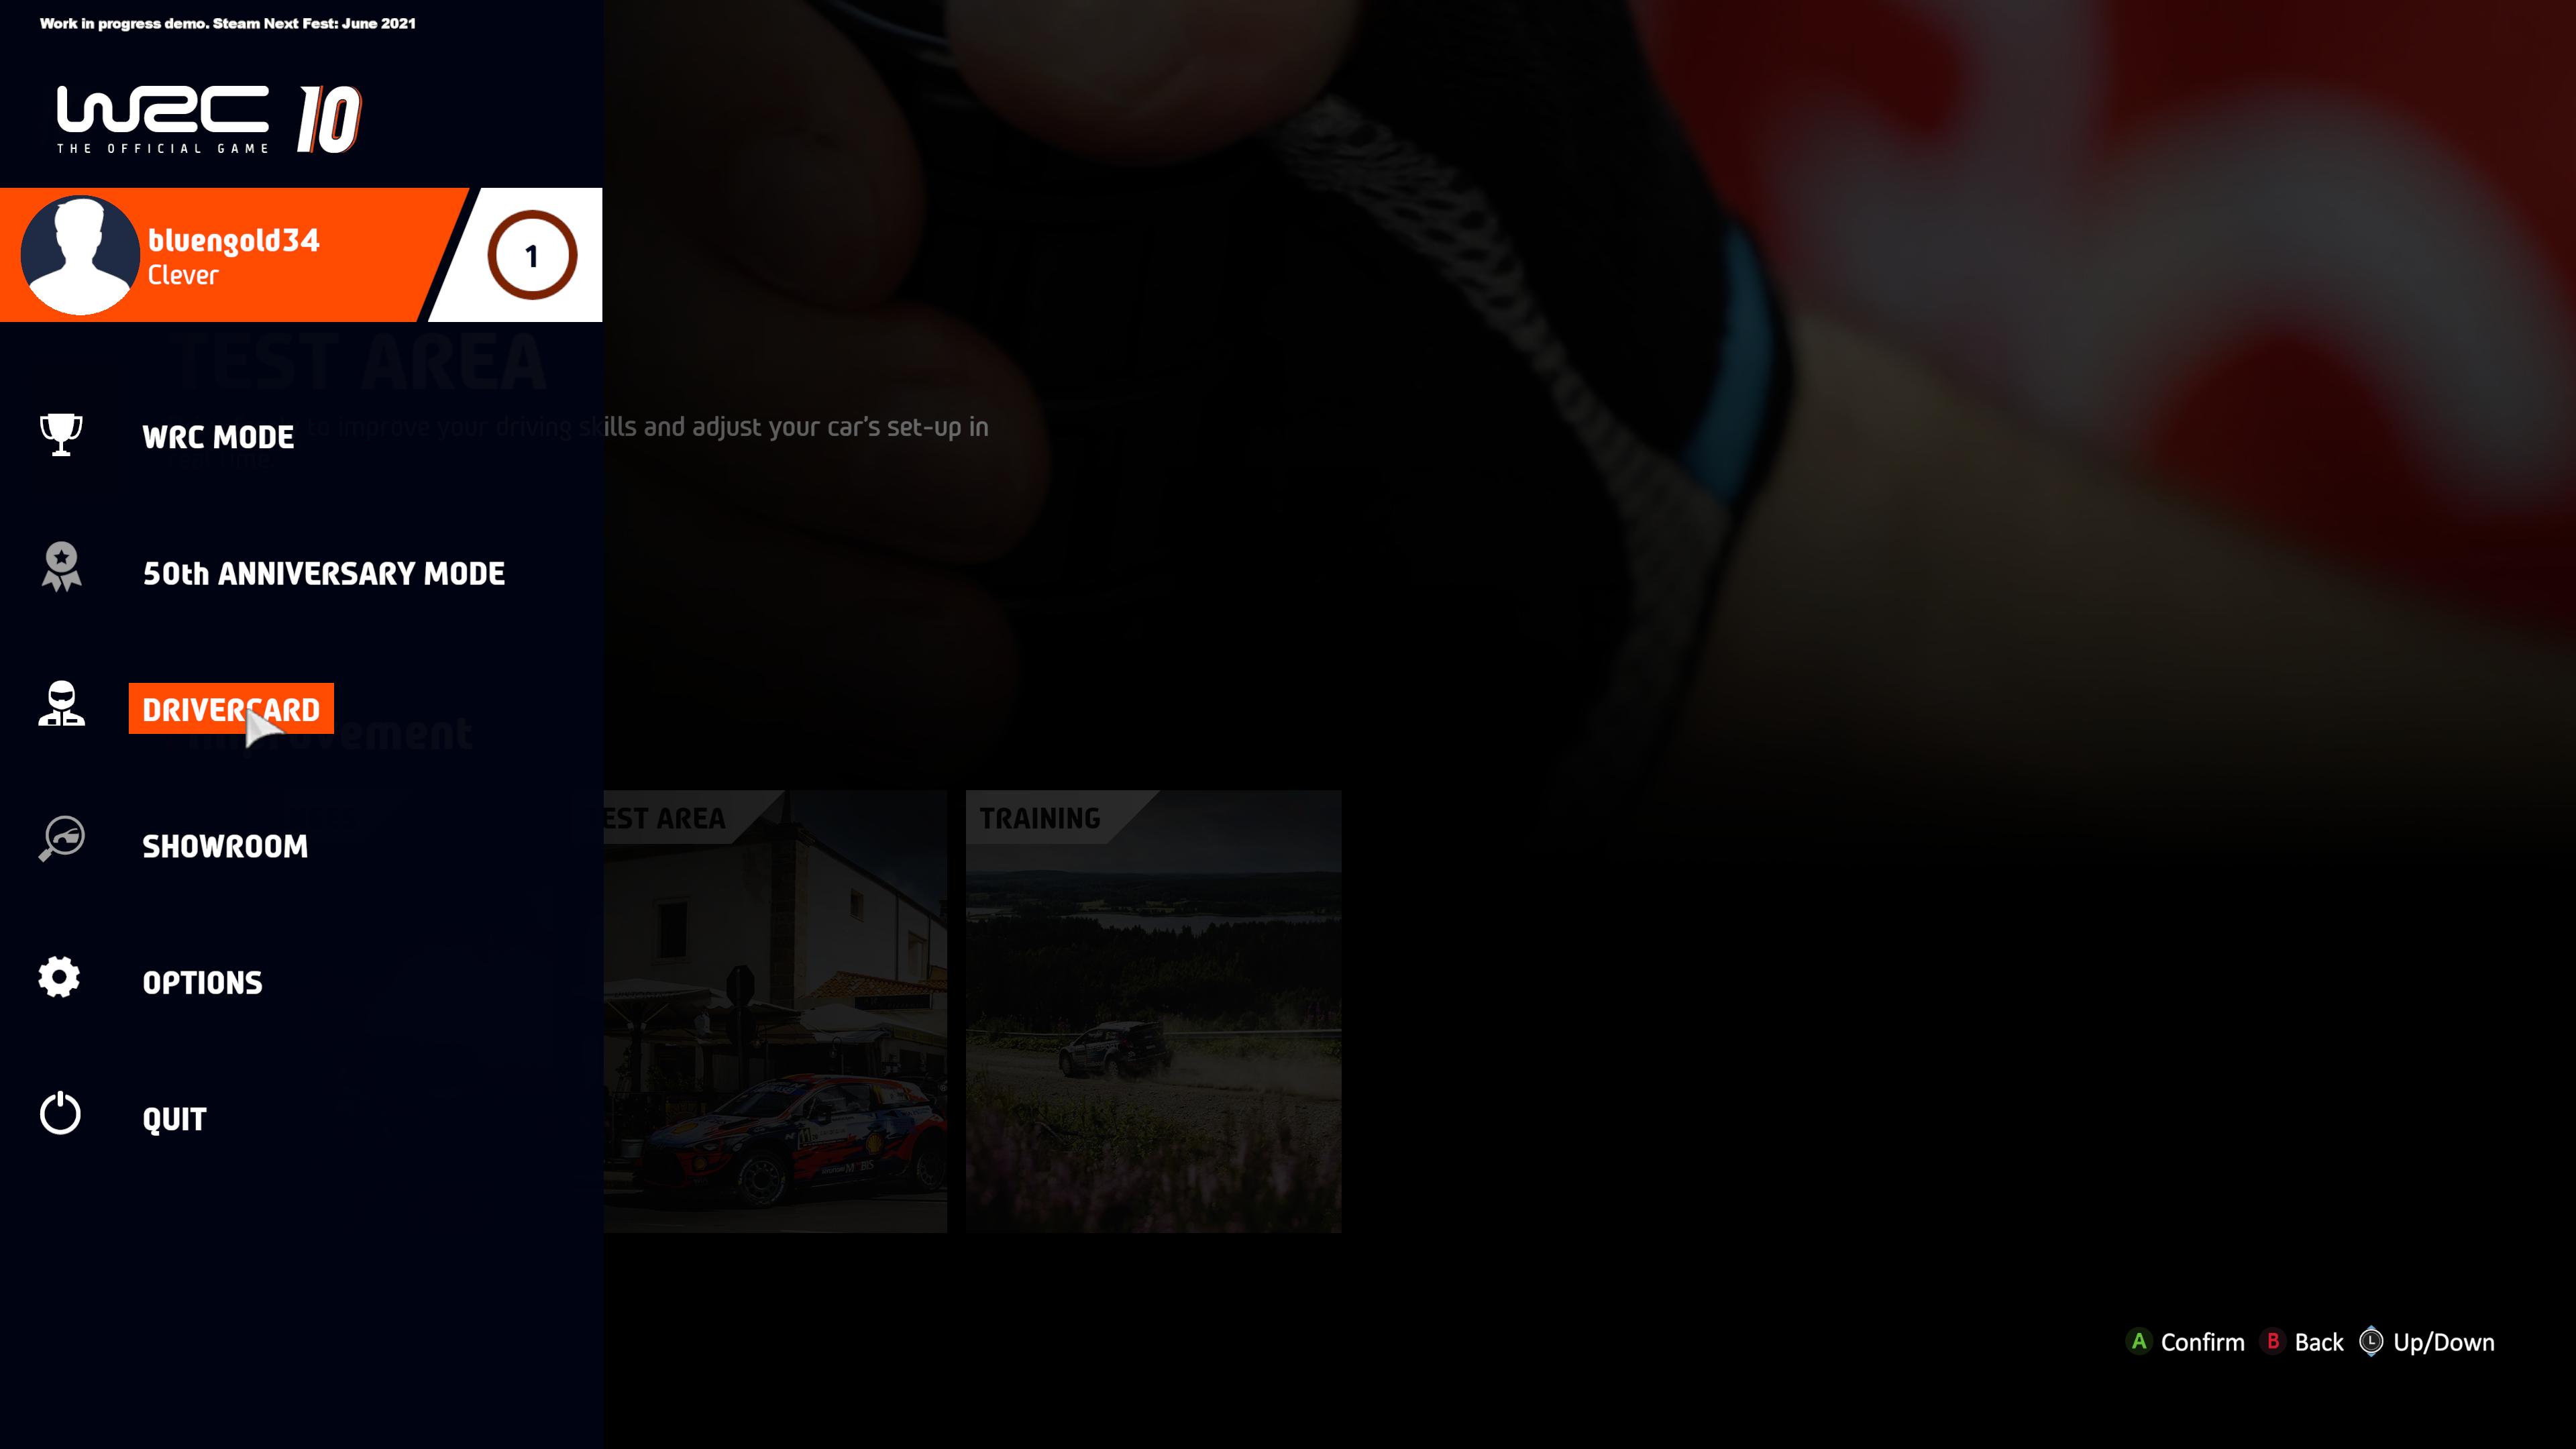 Wrc 10 Fia World Rally Championship Demo Screenshot 2021.06.12 - 13.46.48.58